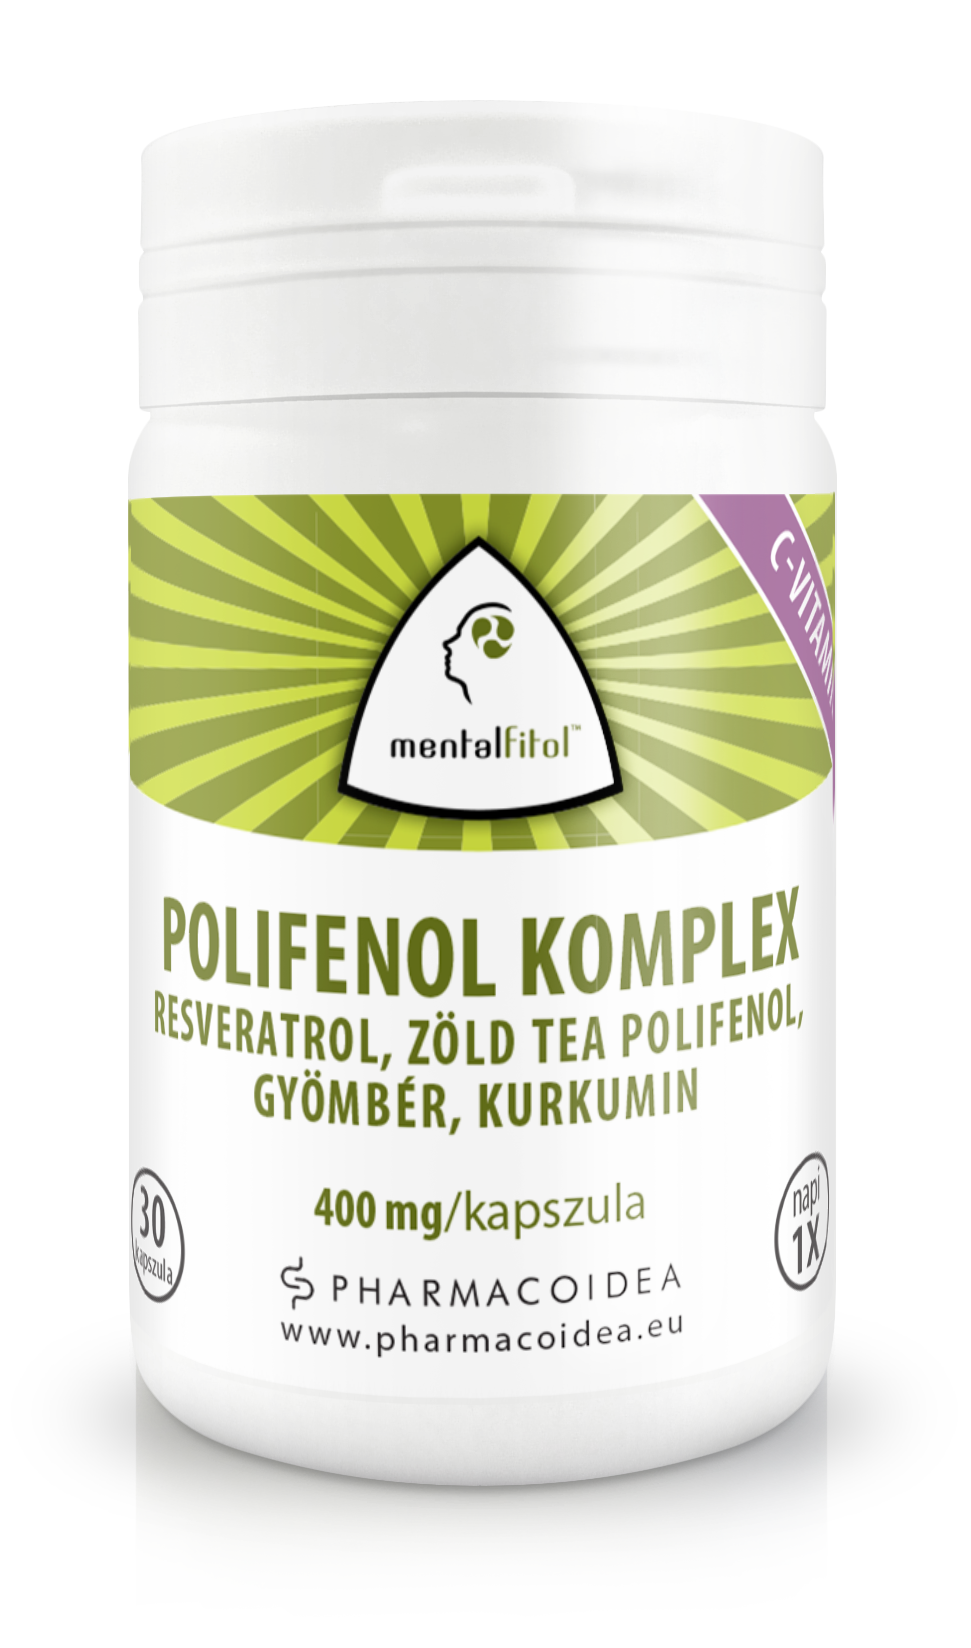 PharmacoIdea Polyphenol complex 30 caps.